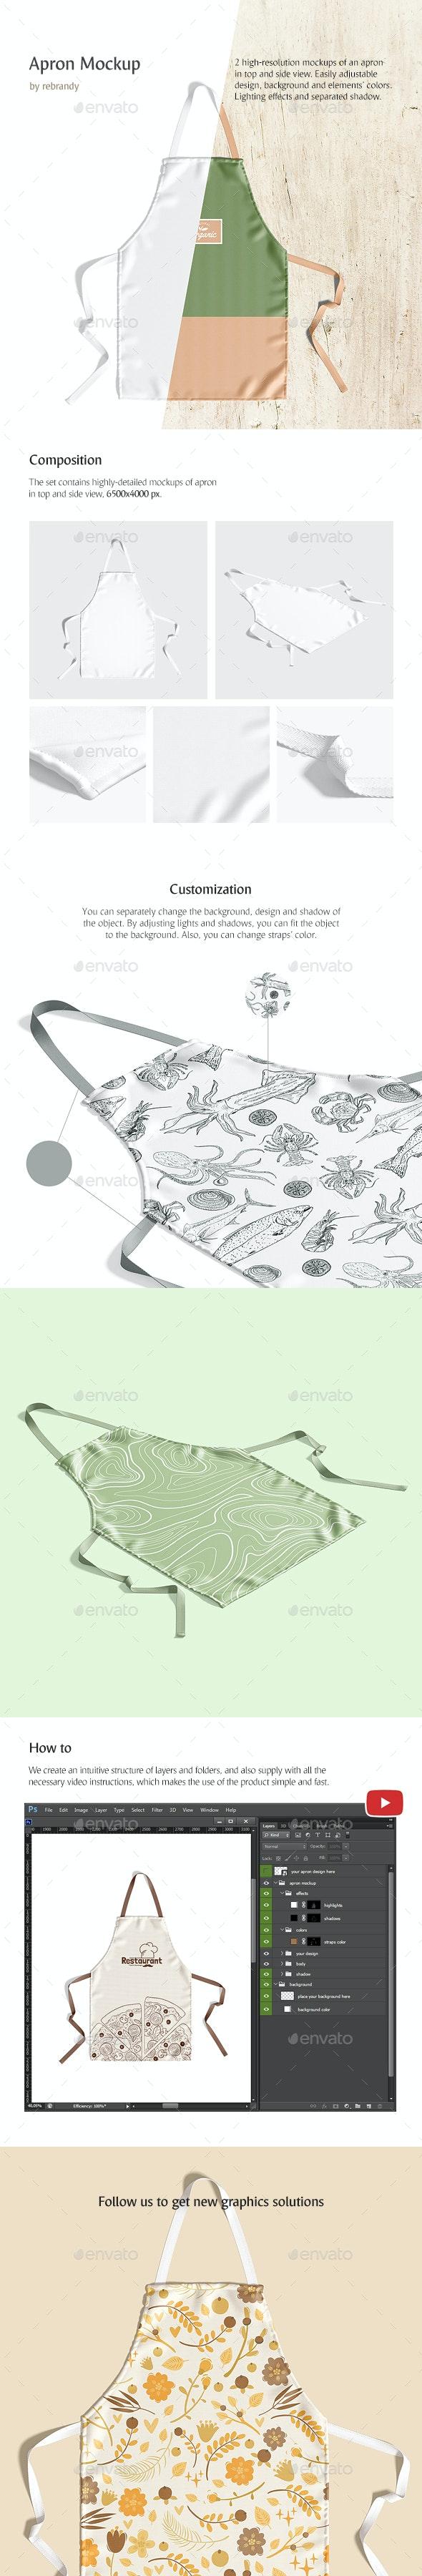 Apron Mockup - Product Mock-Ups Graphics